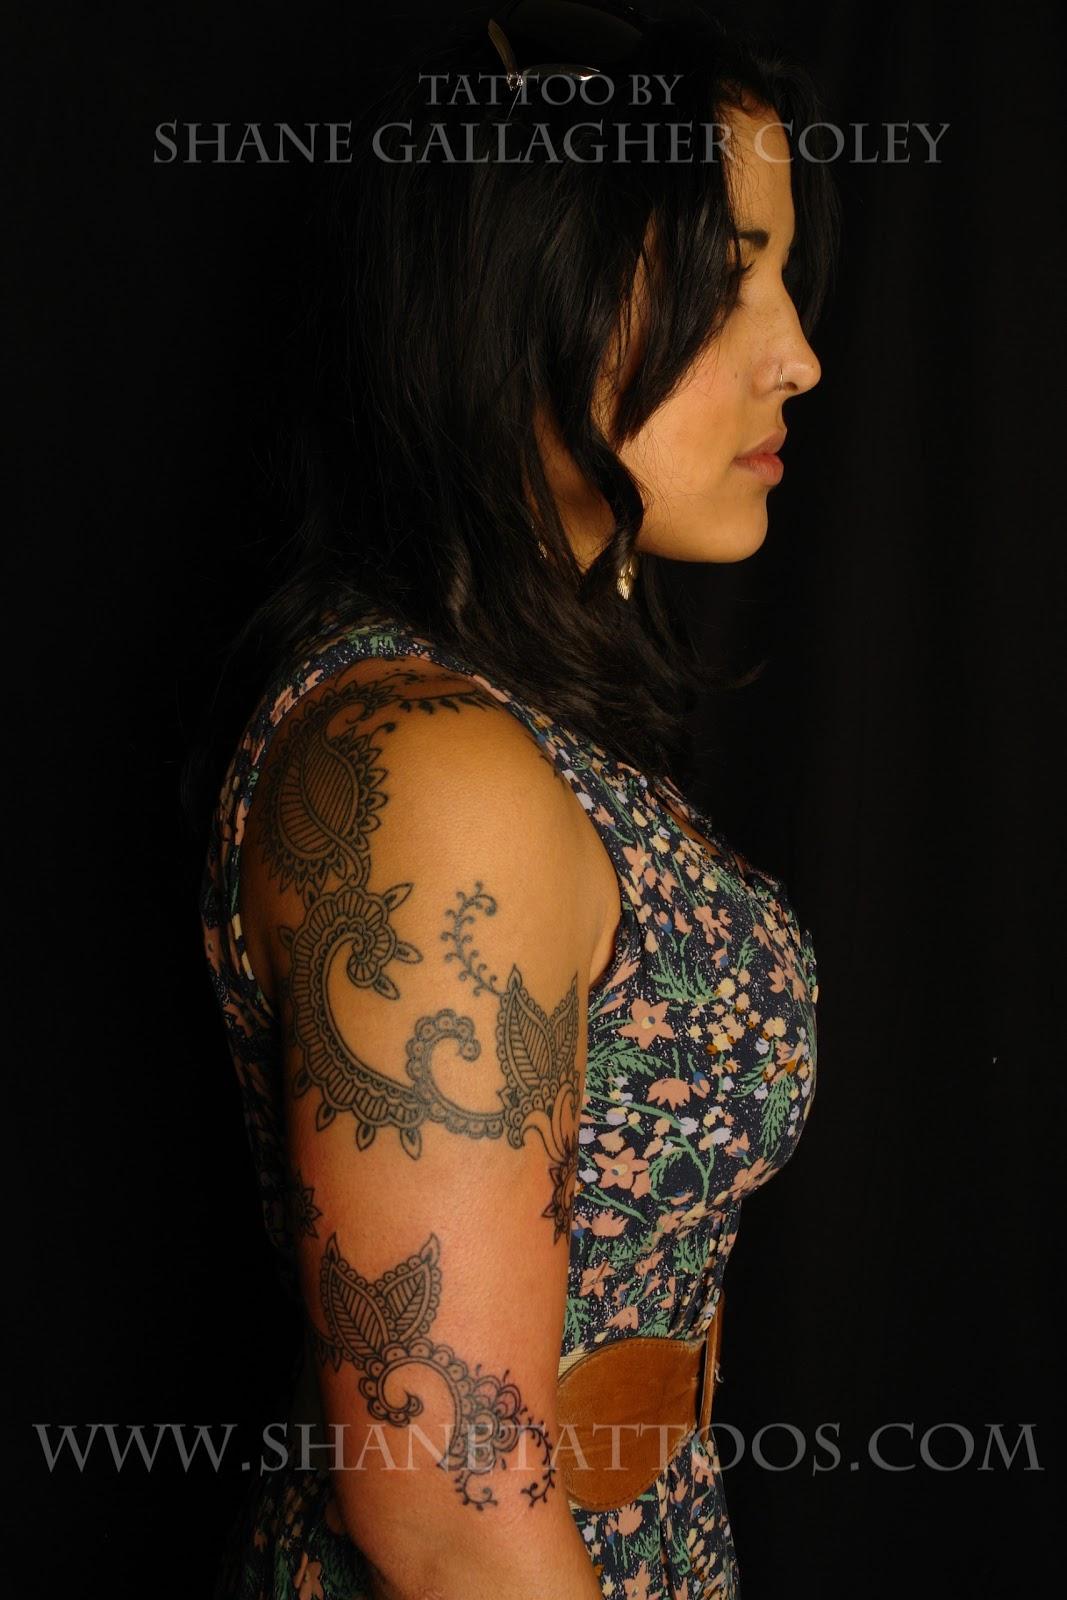 shane tattoos mehndi inspired tattoo on kali. Black Bedroom Furniture Sets. Home Design Ideas